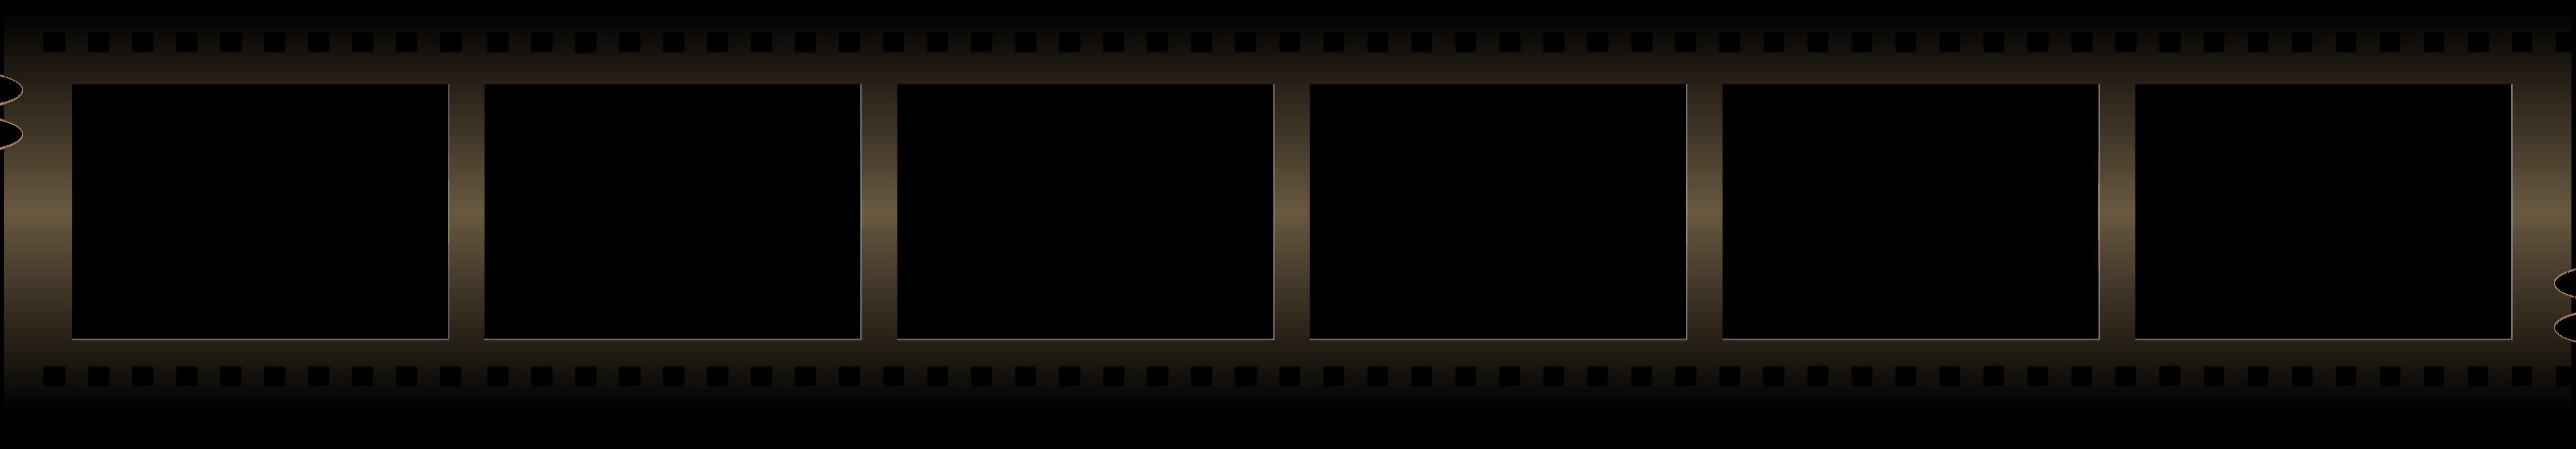 Film clipart wavy. Strip panda free images